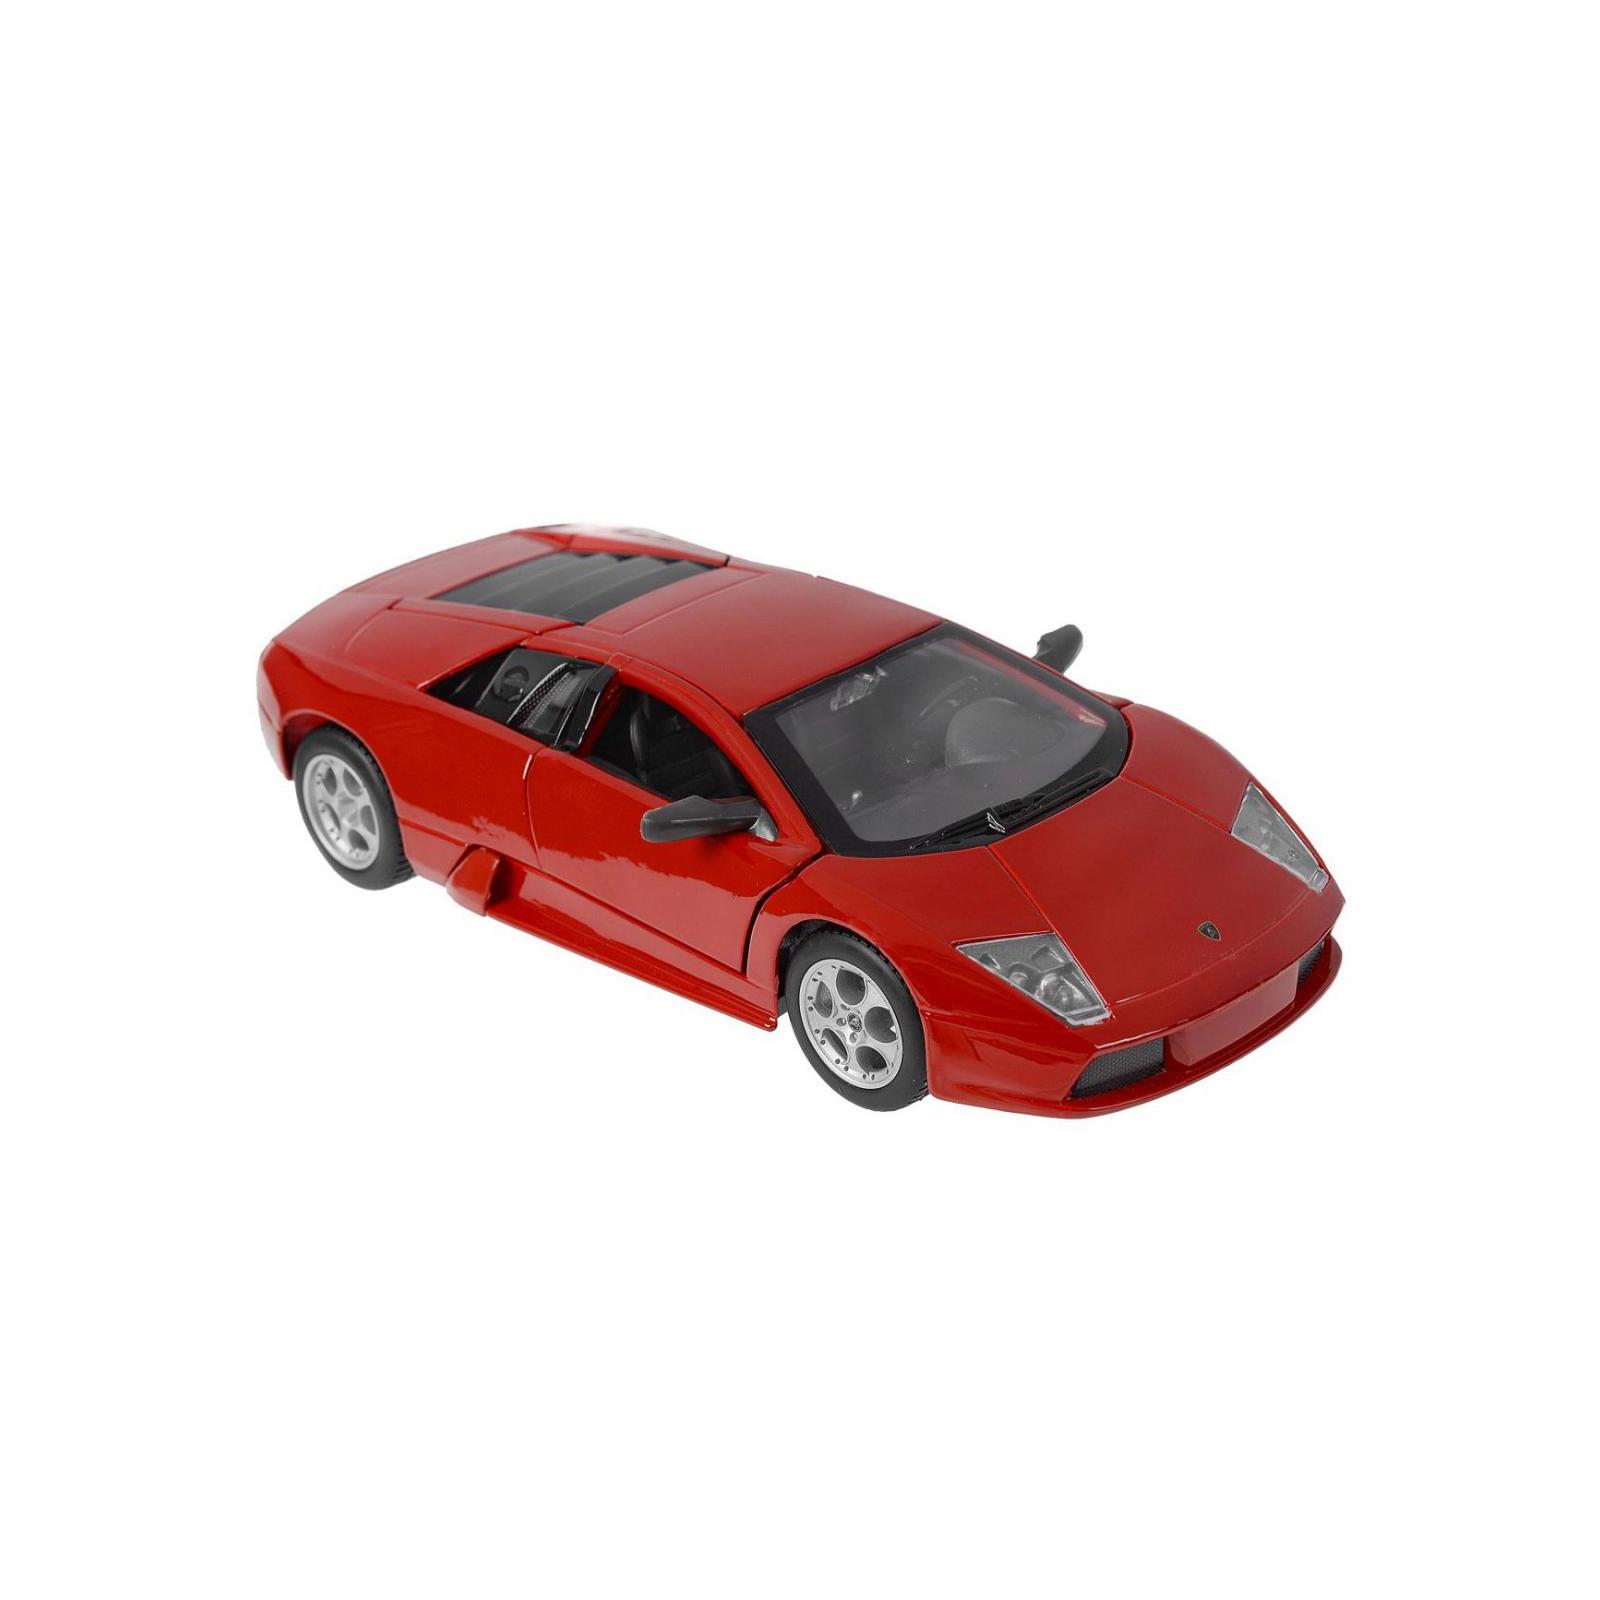 Машина Maisto Lamborghini Murcielago (1:24) красный металлик (31238 red) изображение 4